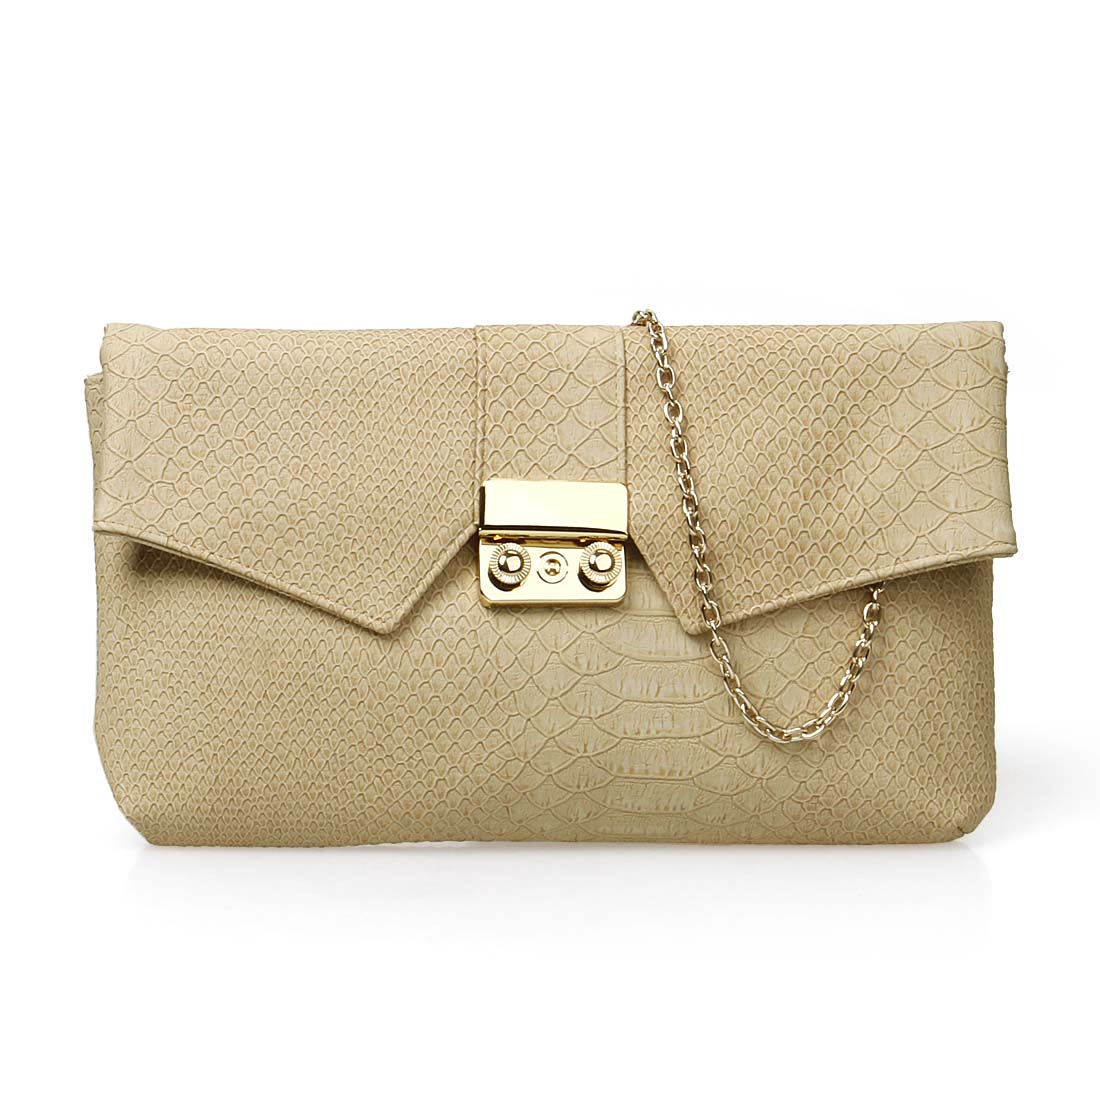 b.m.c BMC Womens PU Leather Faux Snakeskin Textured Envelope Flap Fashion Clutch at Sears.com